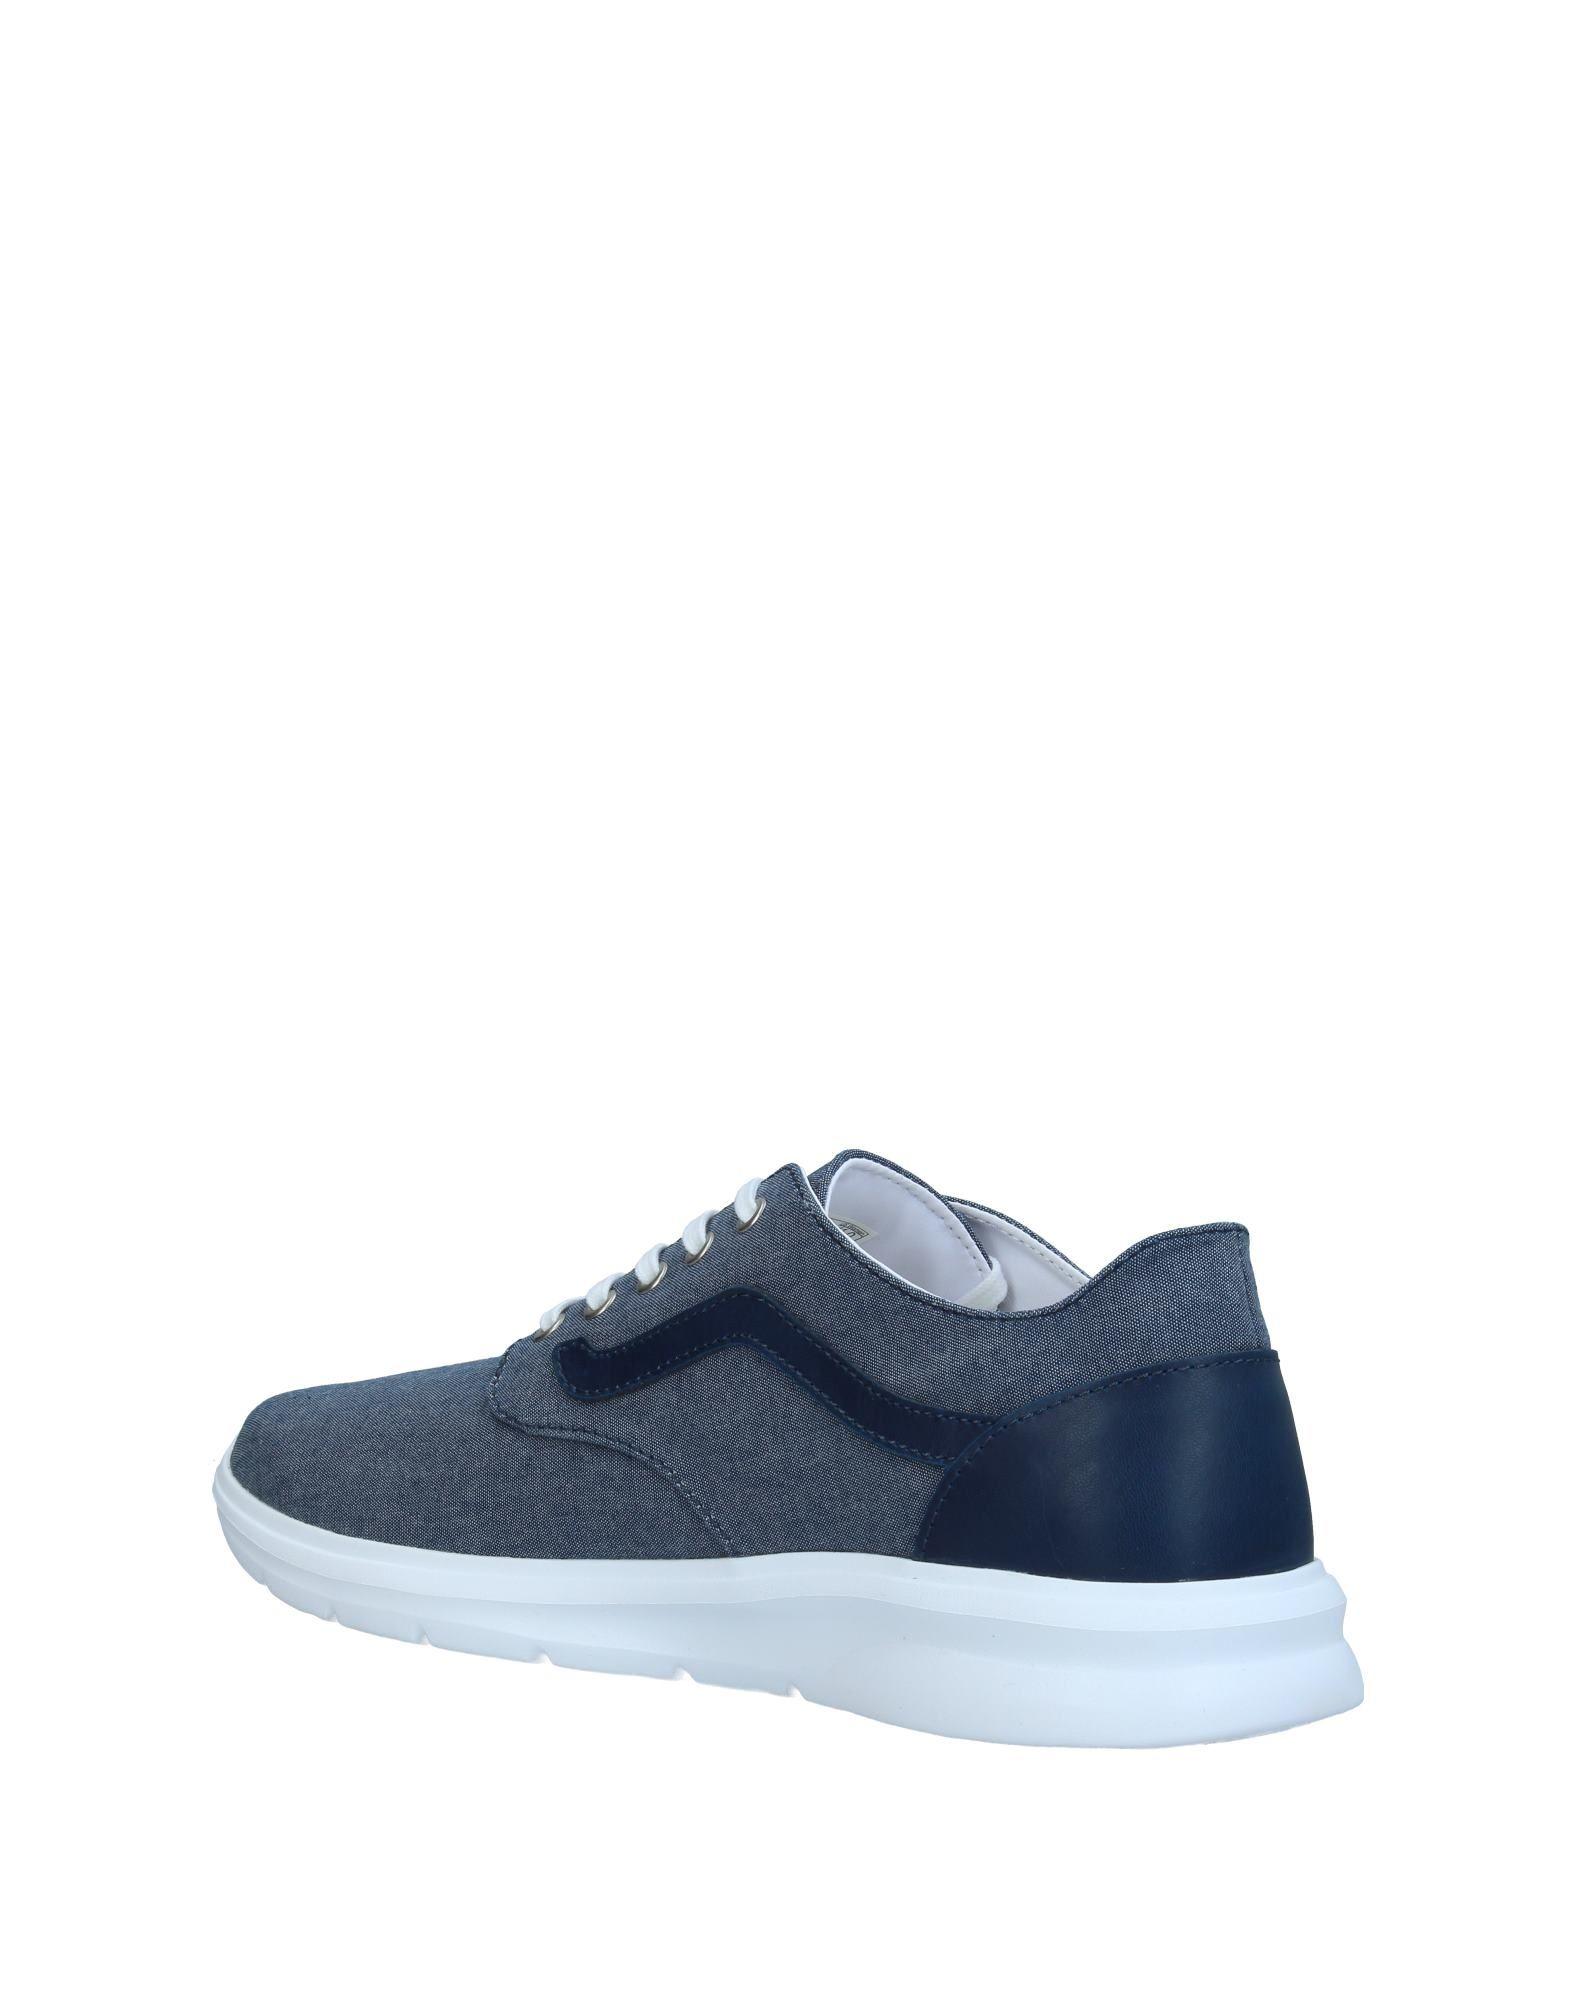 Moda Sneakers Sneakers Moda Vans Uomo - 11376482BX 272183